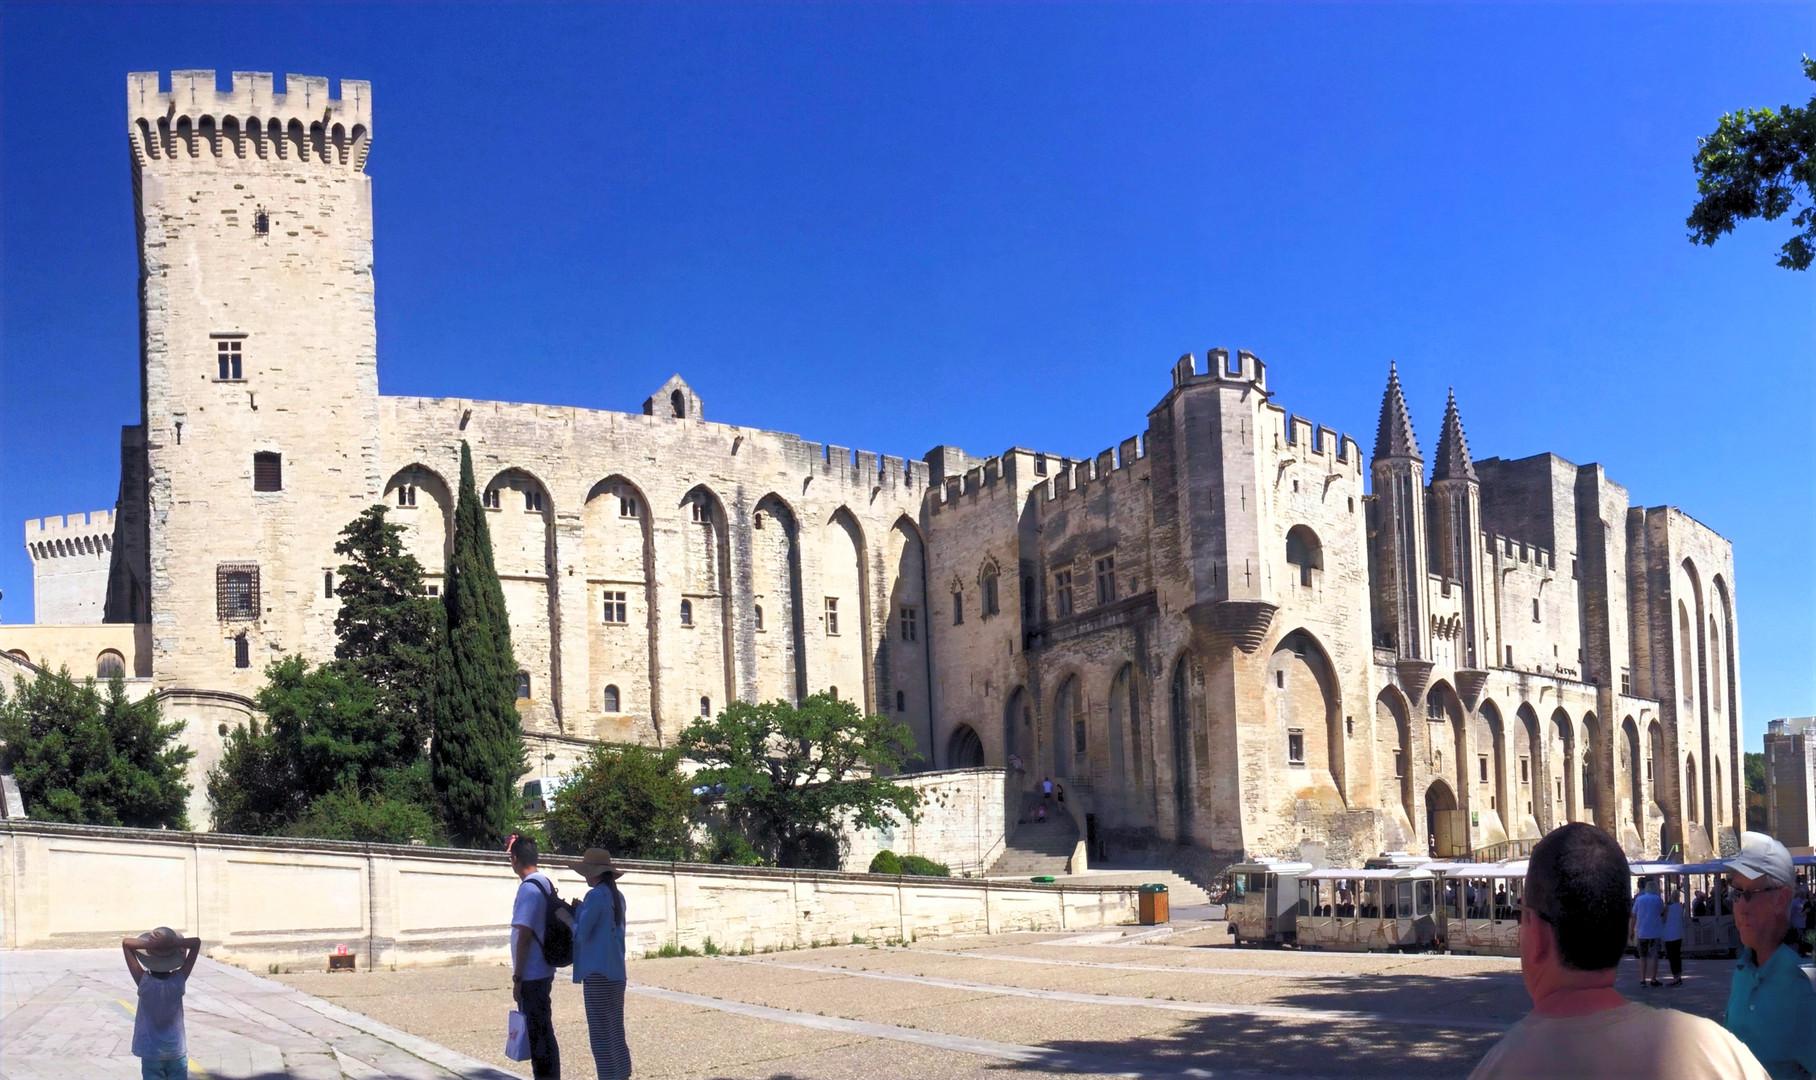 The Walls of Avignon